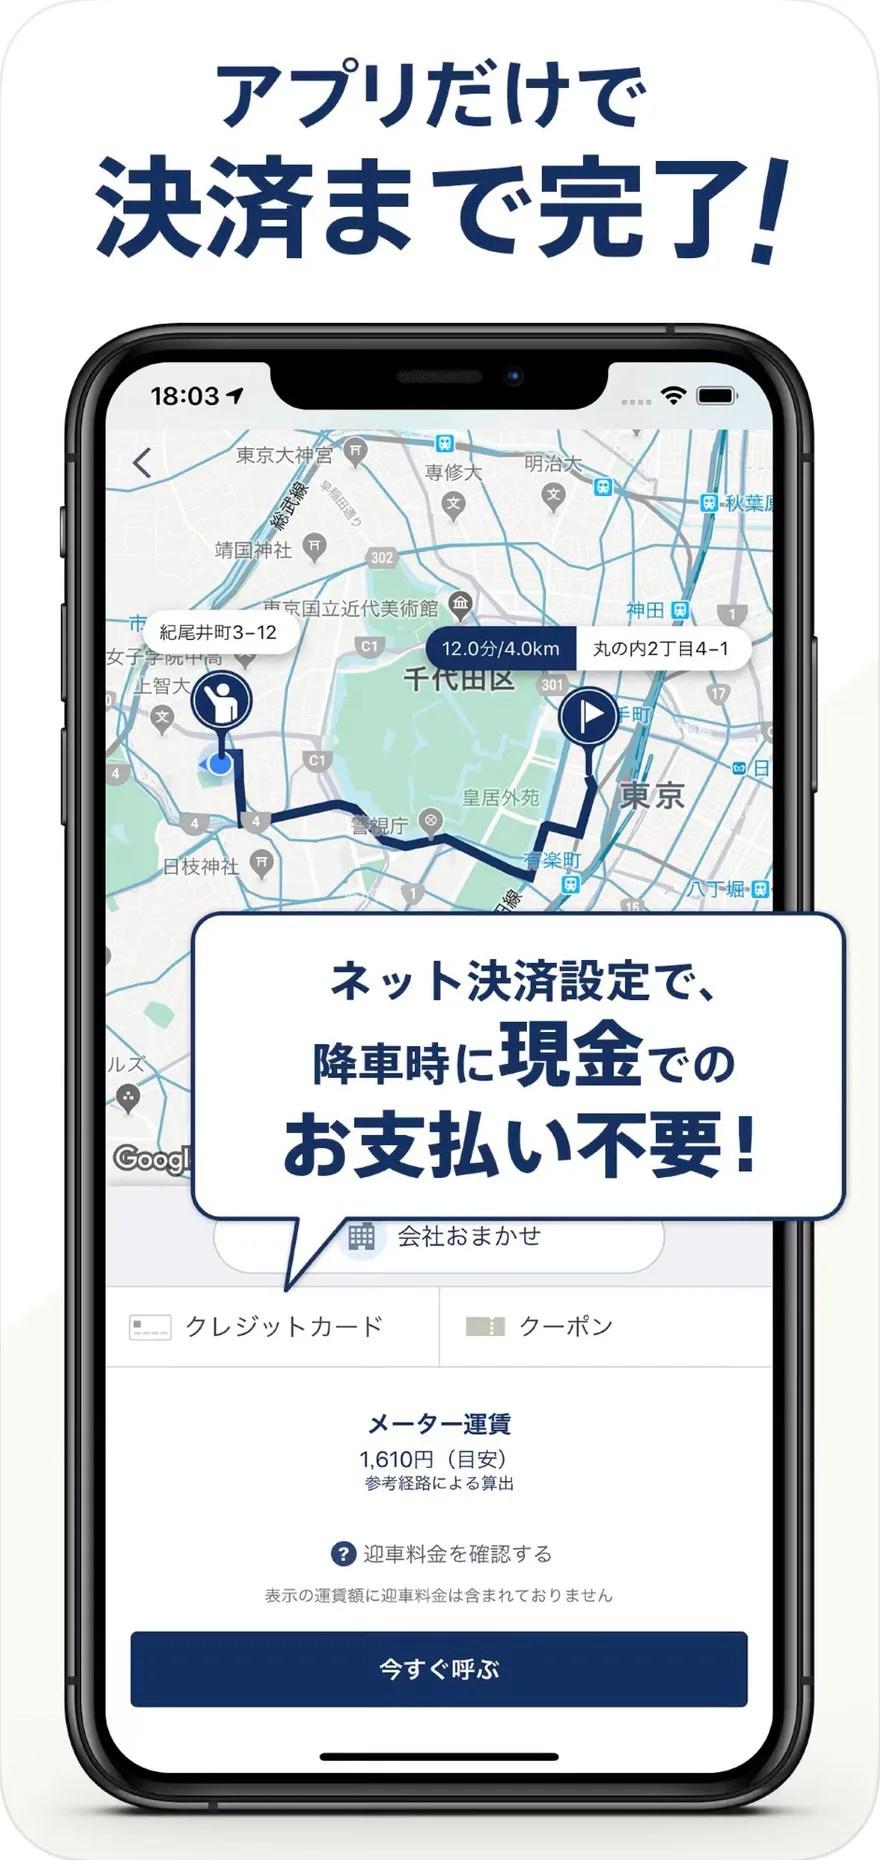 Japantaxi画面